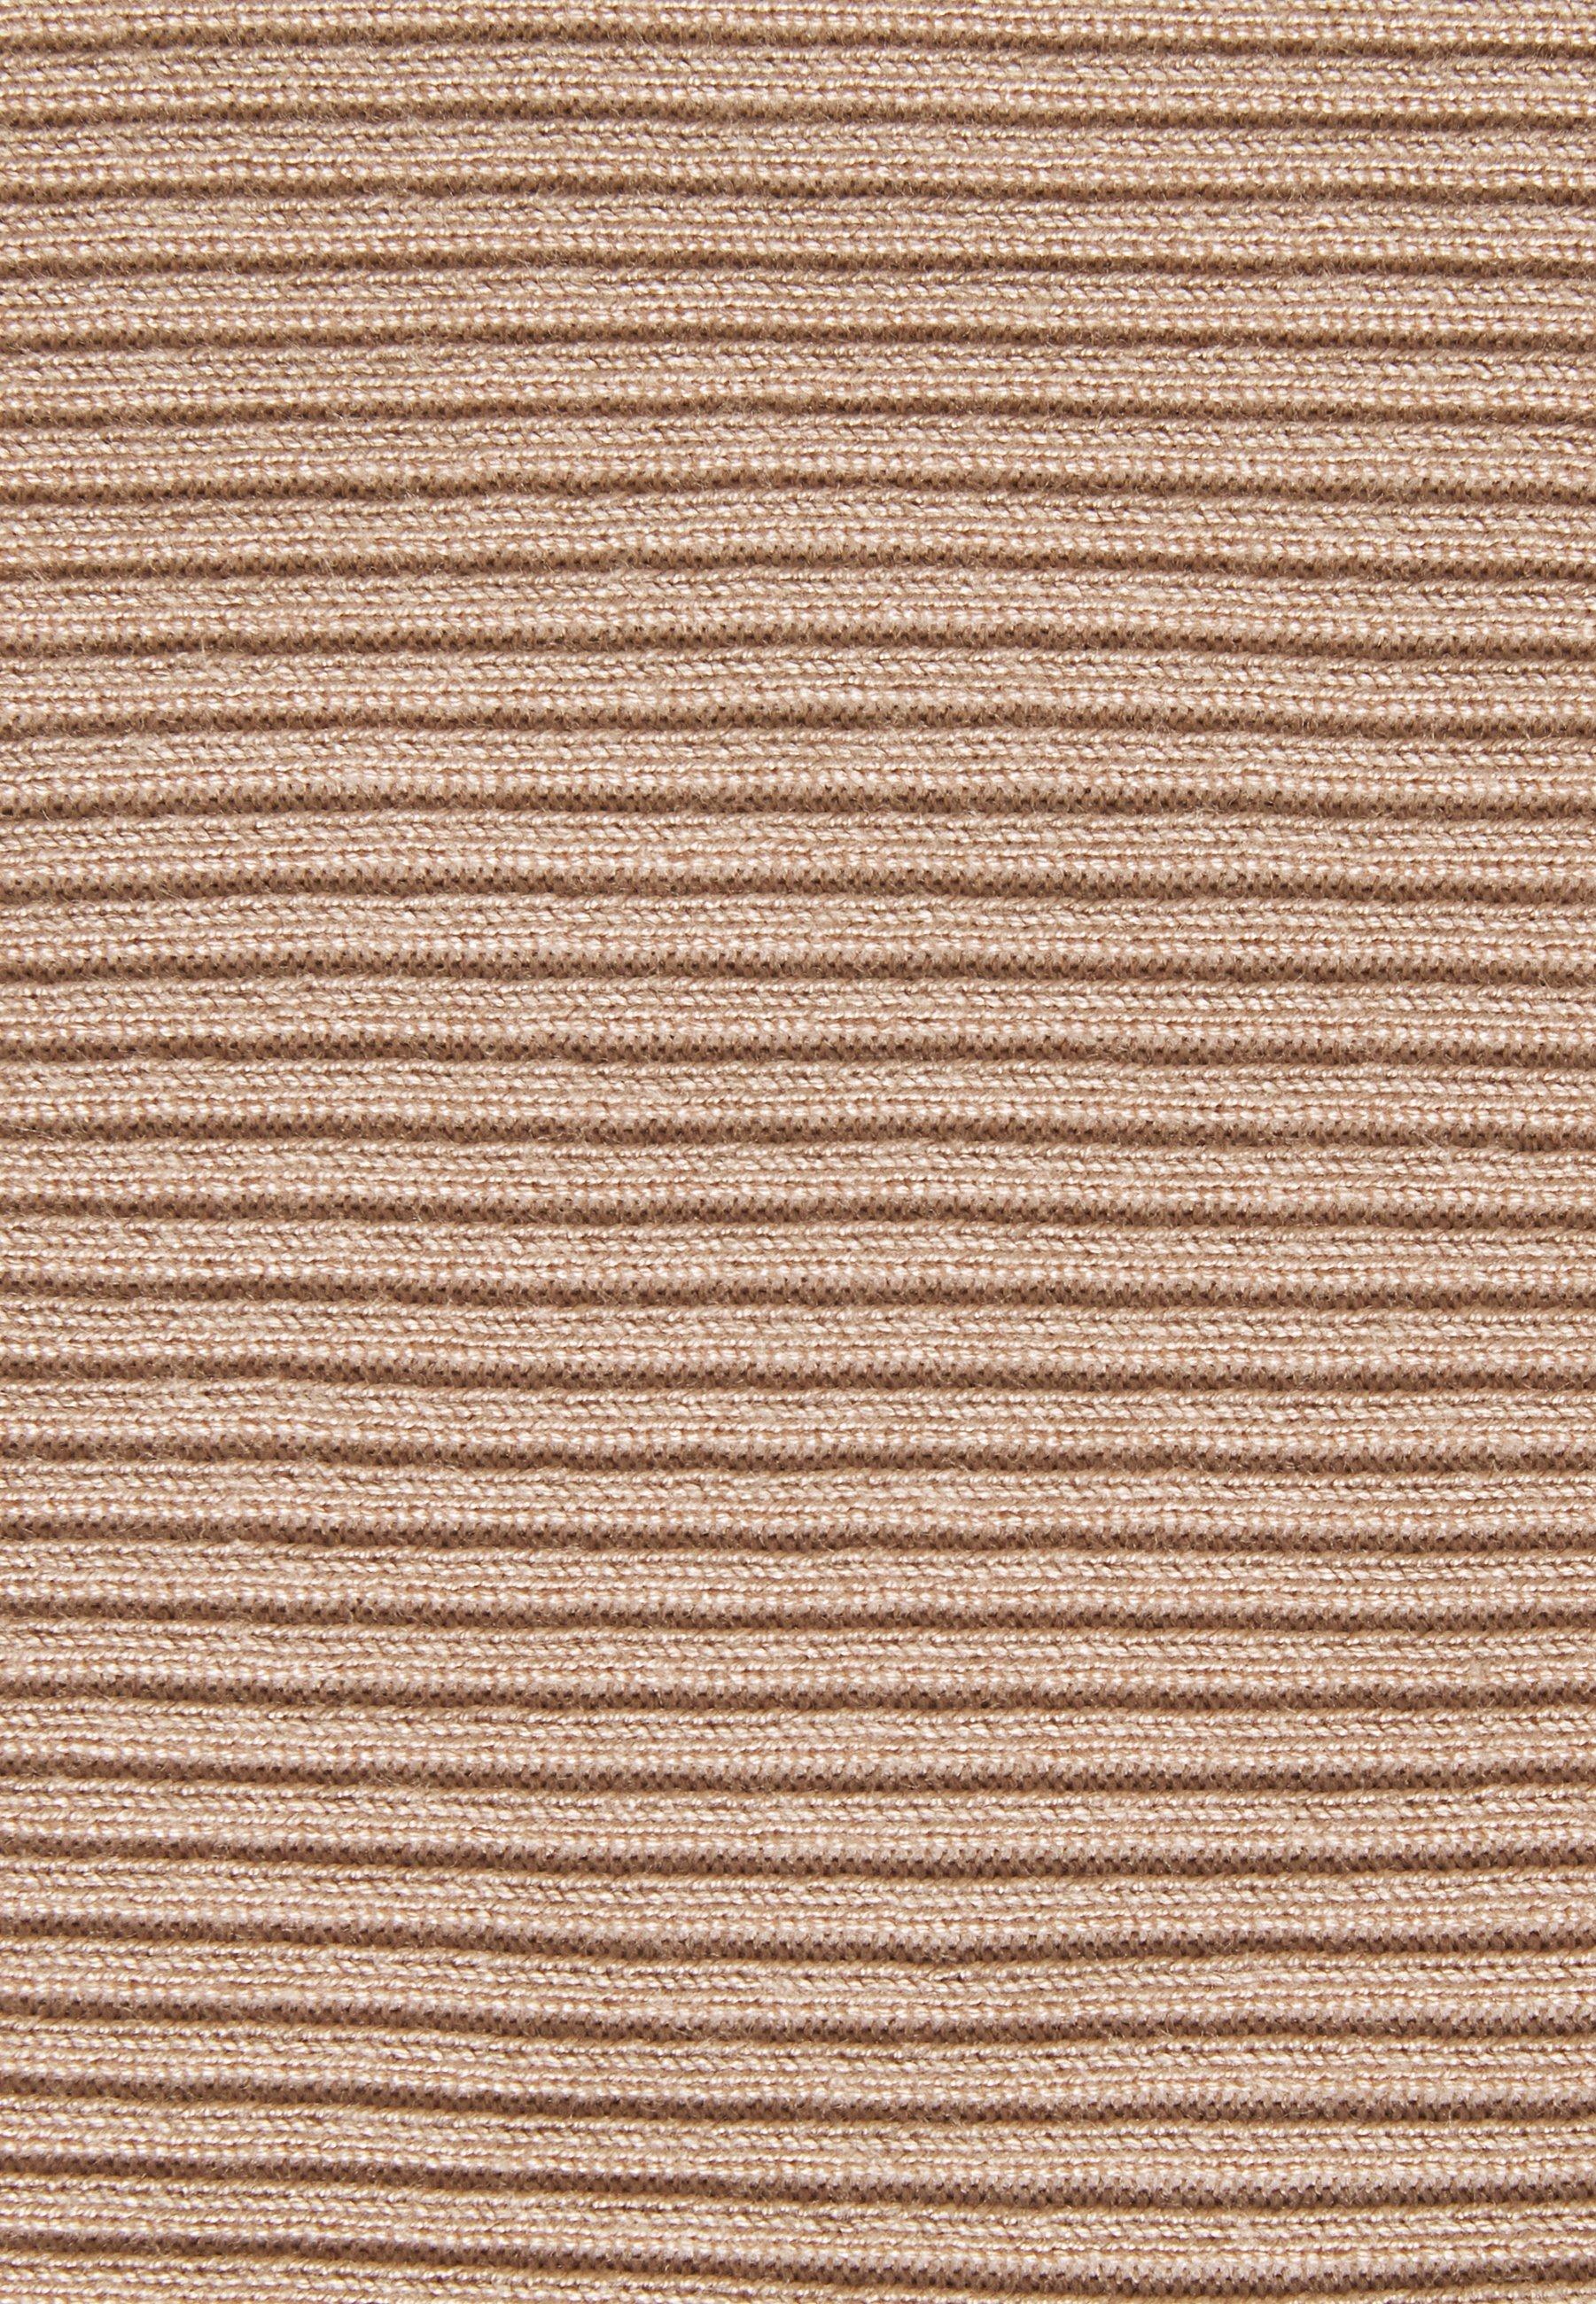 Missguided Tall Roll Neck Crop Jumper - Strikkegenser Sand/beige